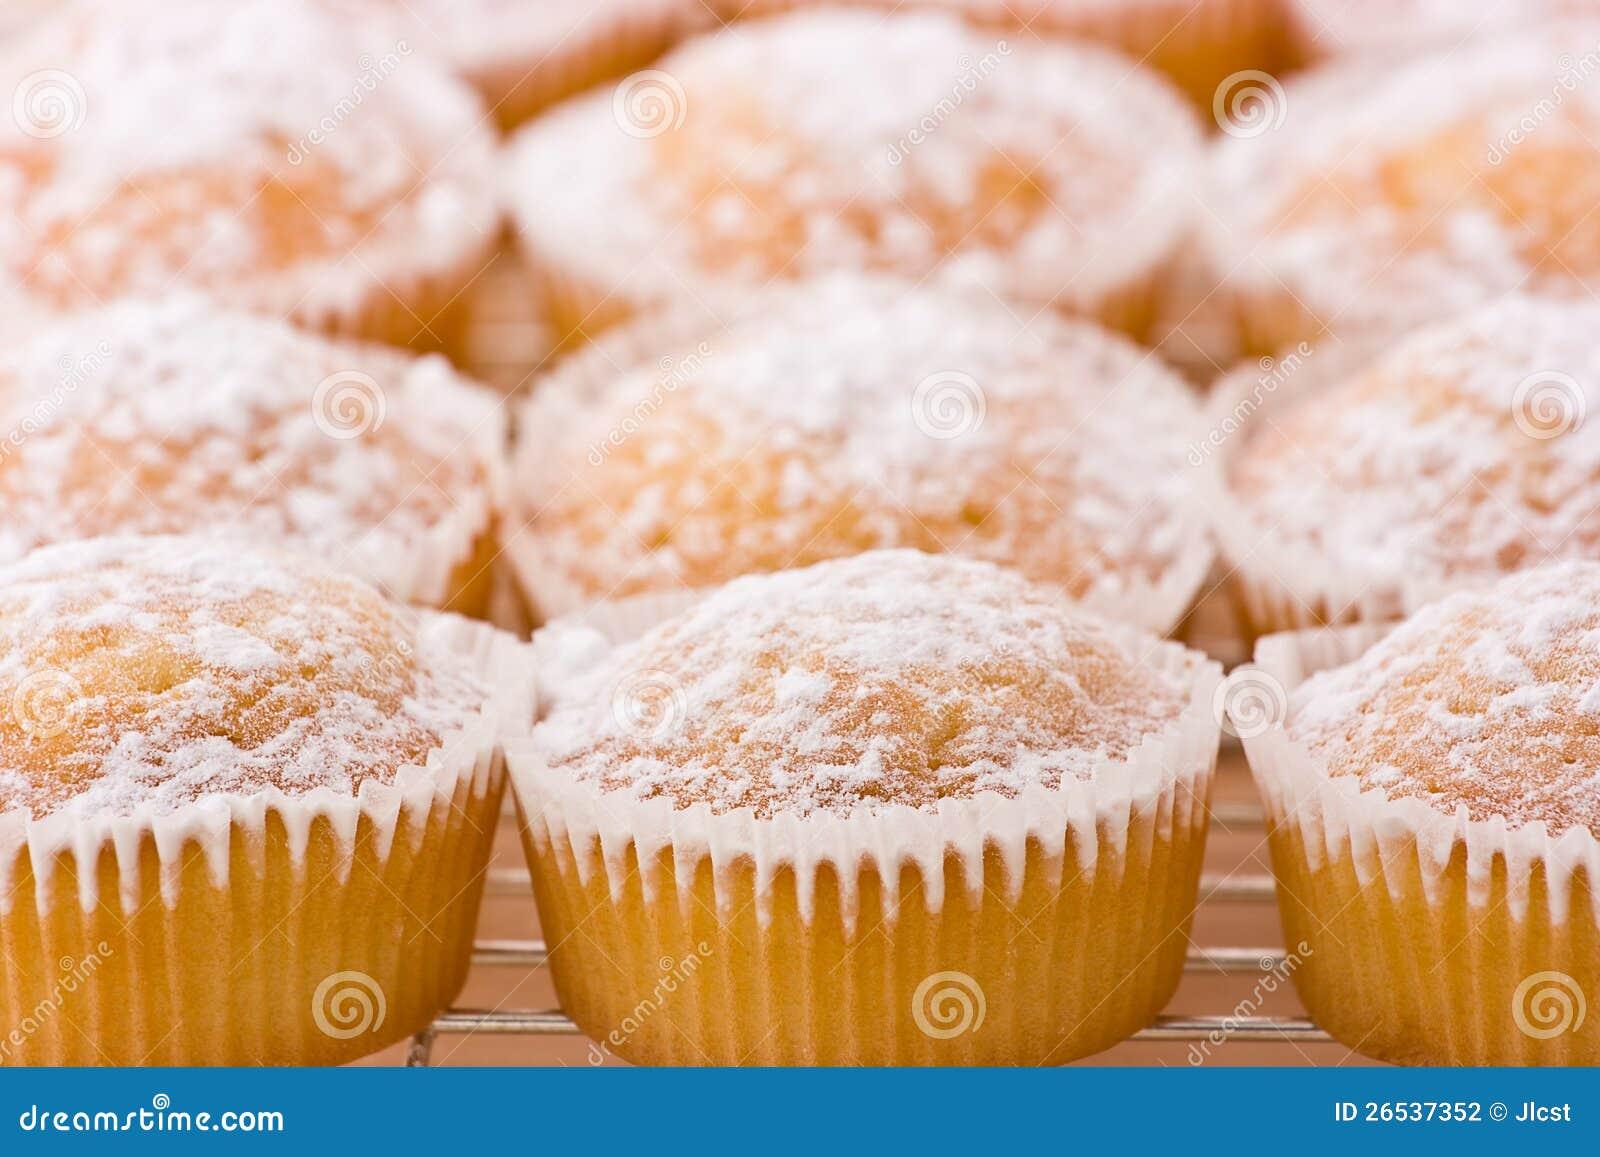 Dusting Icing Sugar On Cake